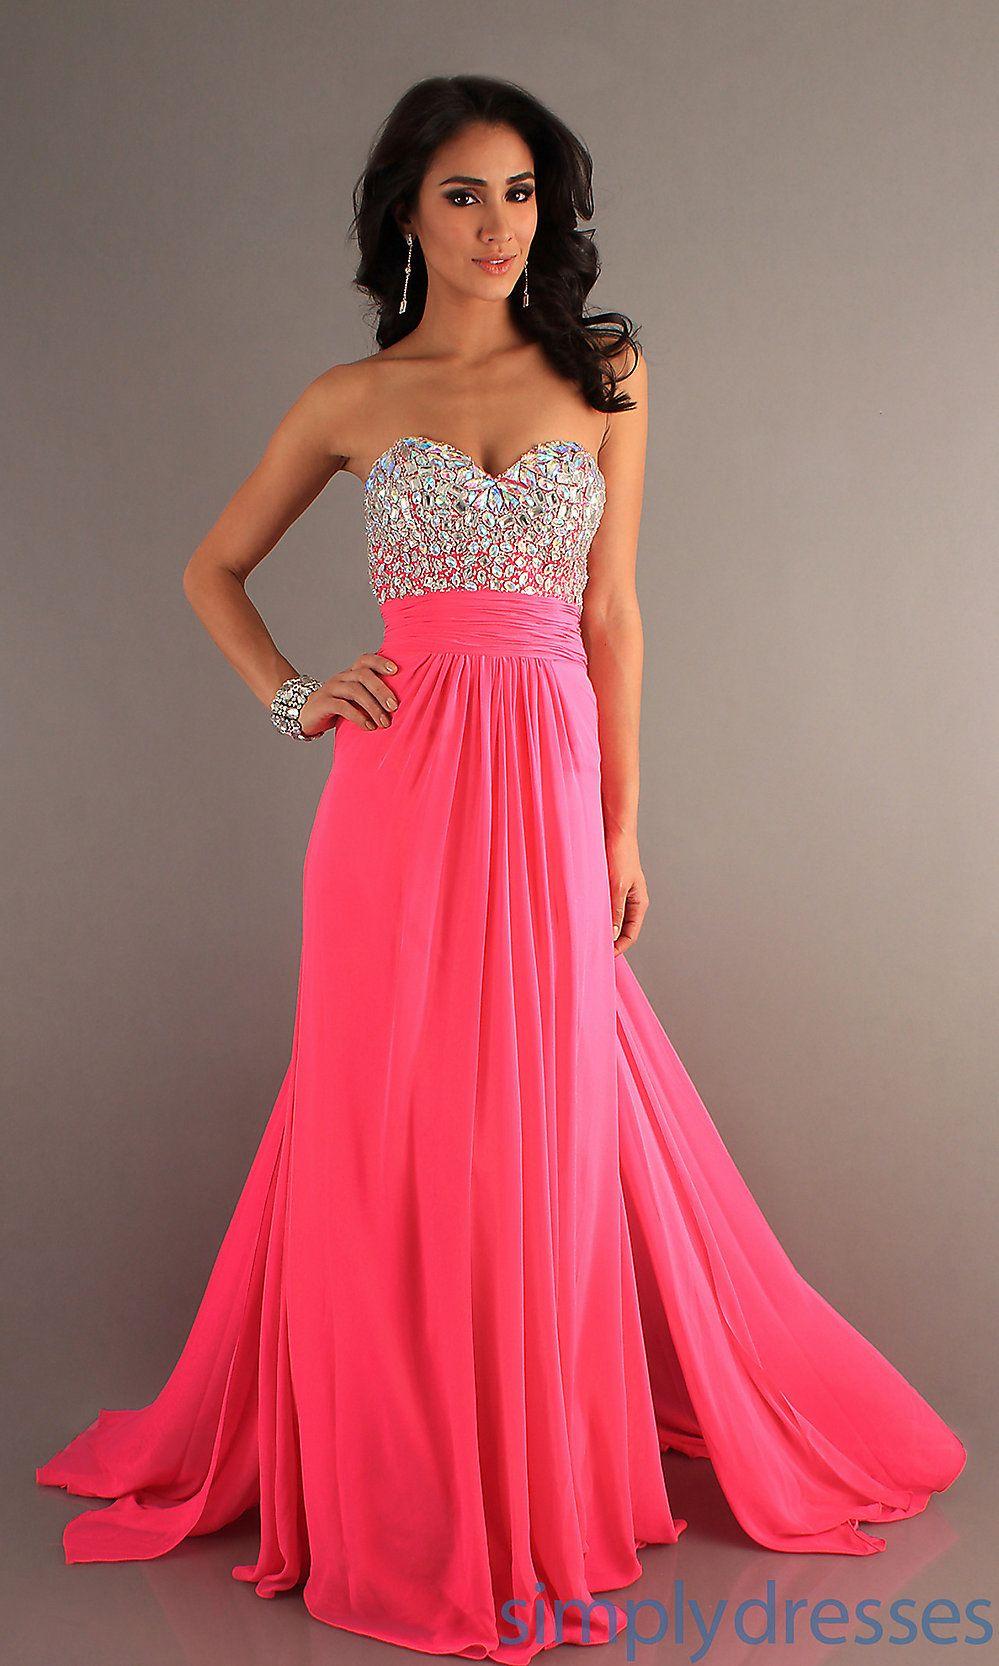 PINK sweetheart long dress  Prom 2k15  Pinterest  Prom Prom dresses 2015 and Dress prom